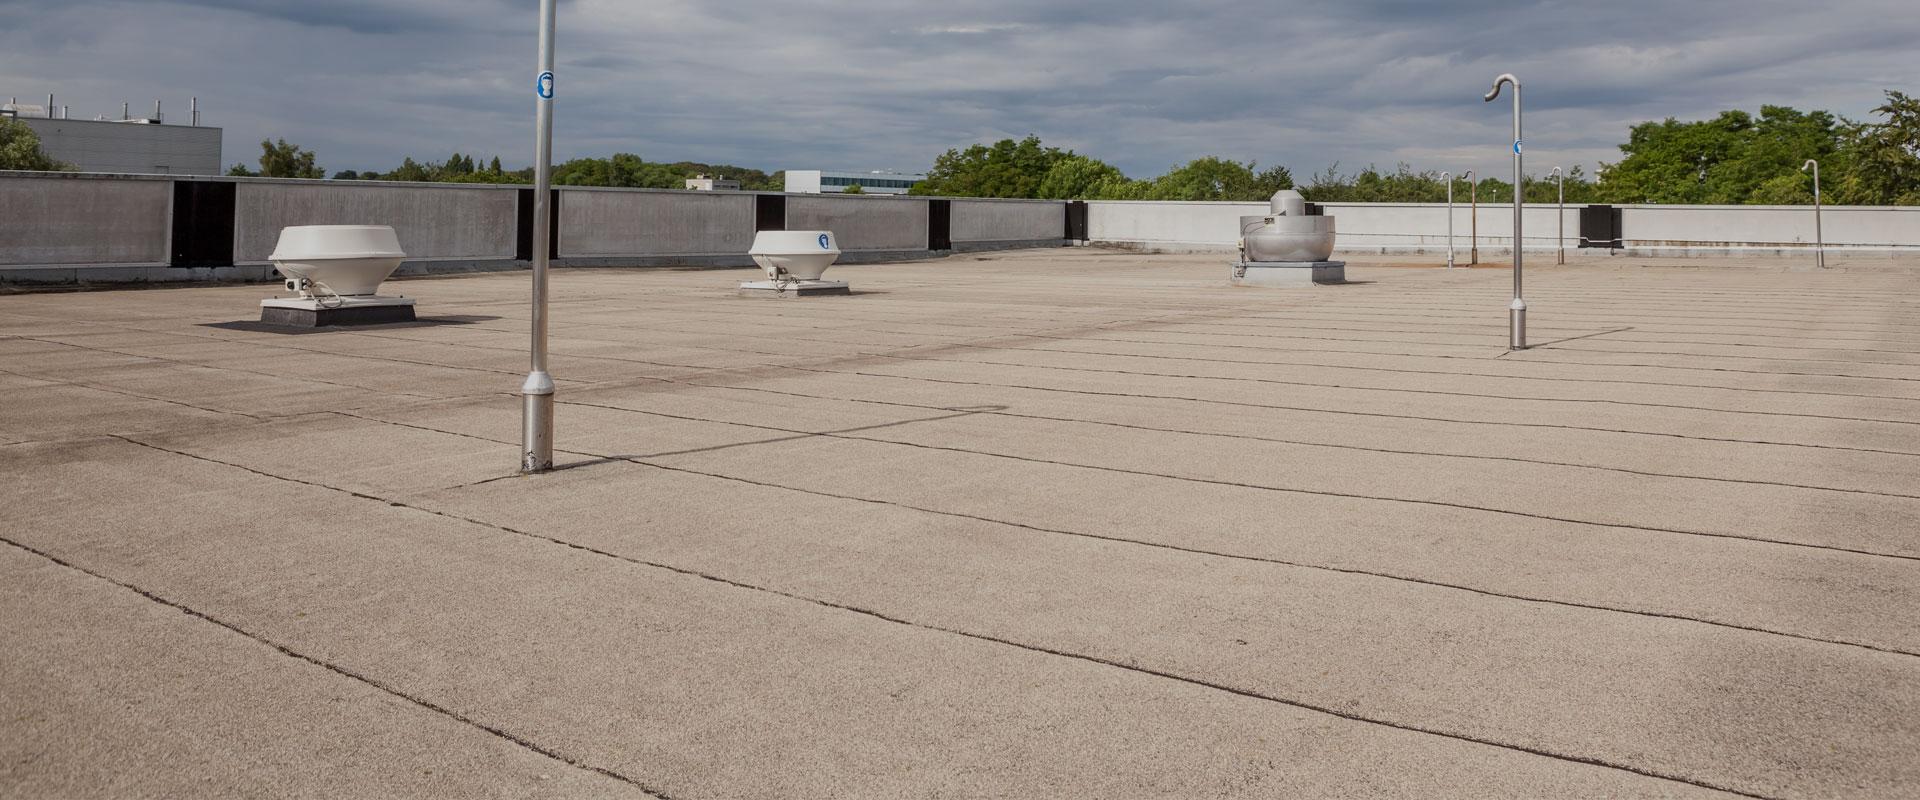 c753d93d9103 Commercial Roofing Contractor